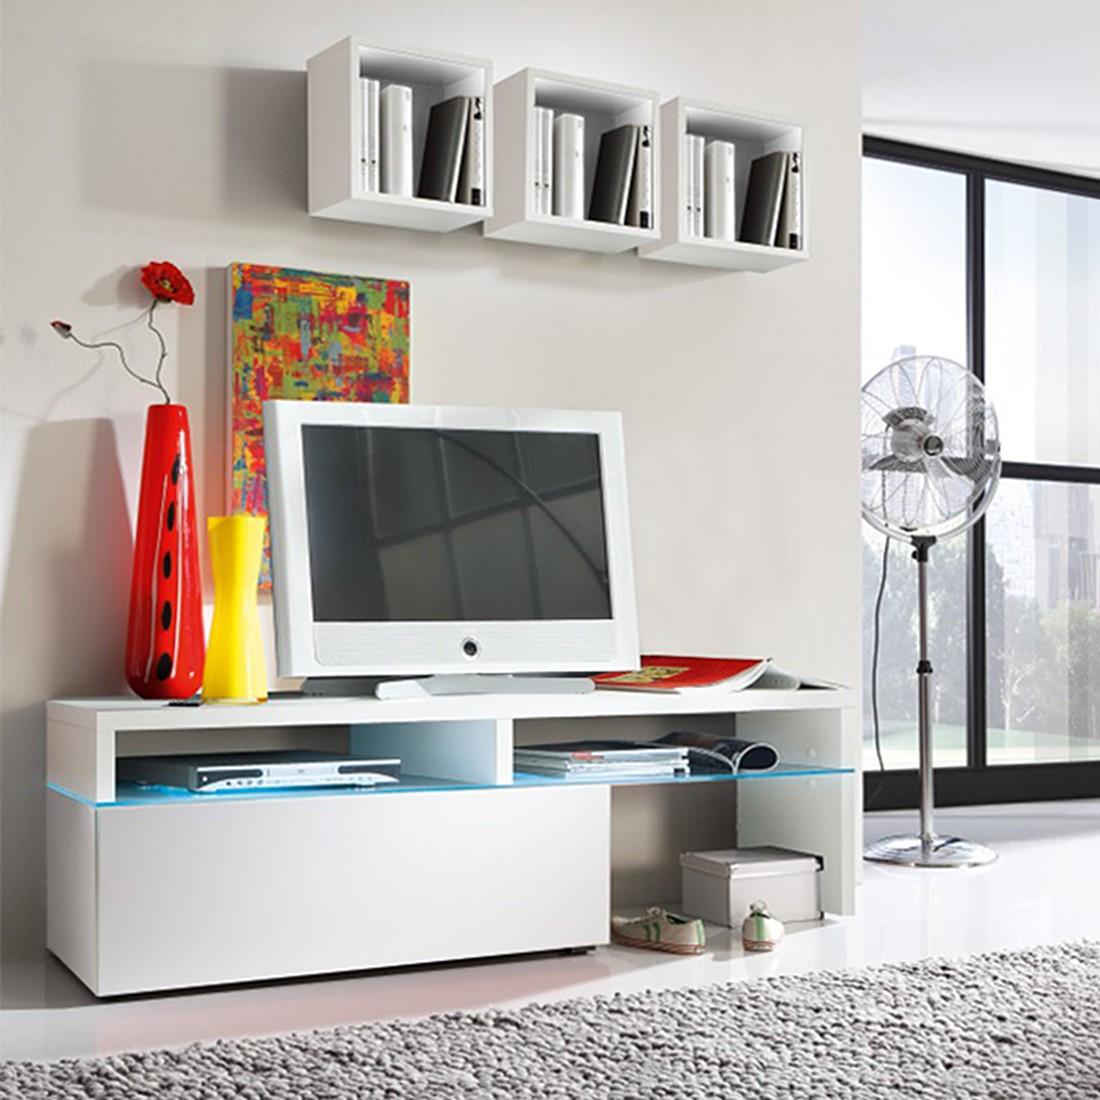 eek a wohnwand colourart 4 teilig wei mit led beleuchtung fernbedienung cs schmal. Black Bedroom Furniture Sets. Home Design Ideas